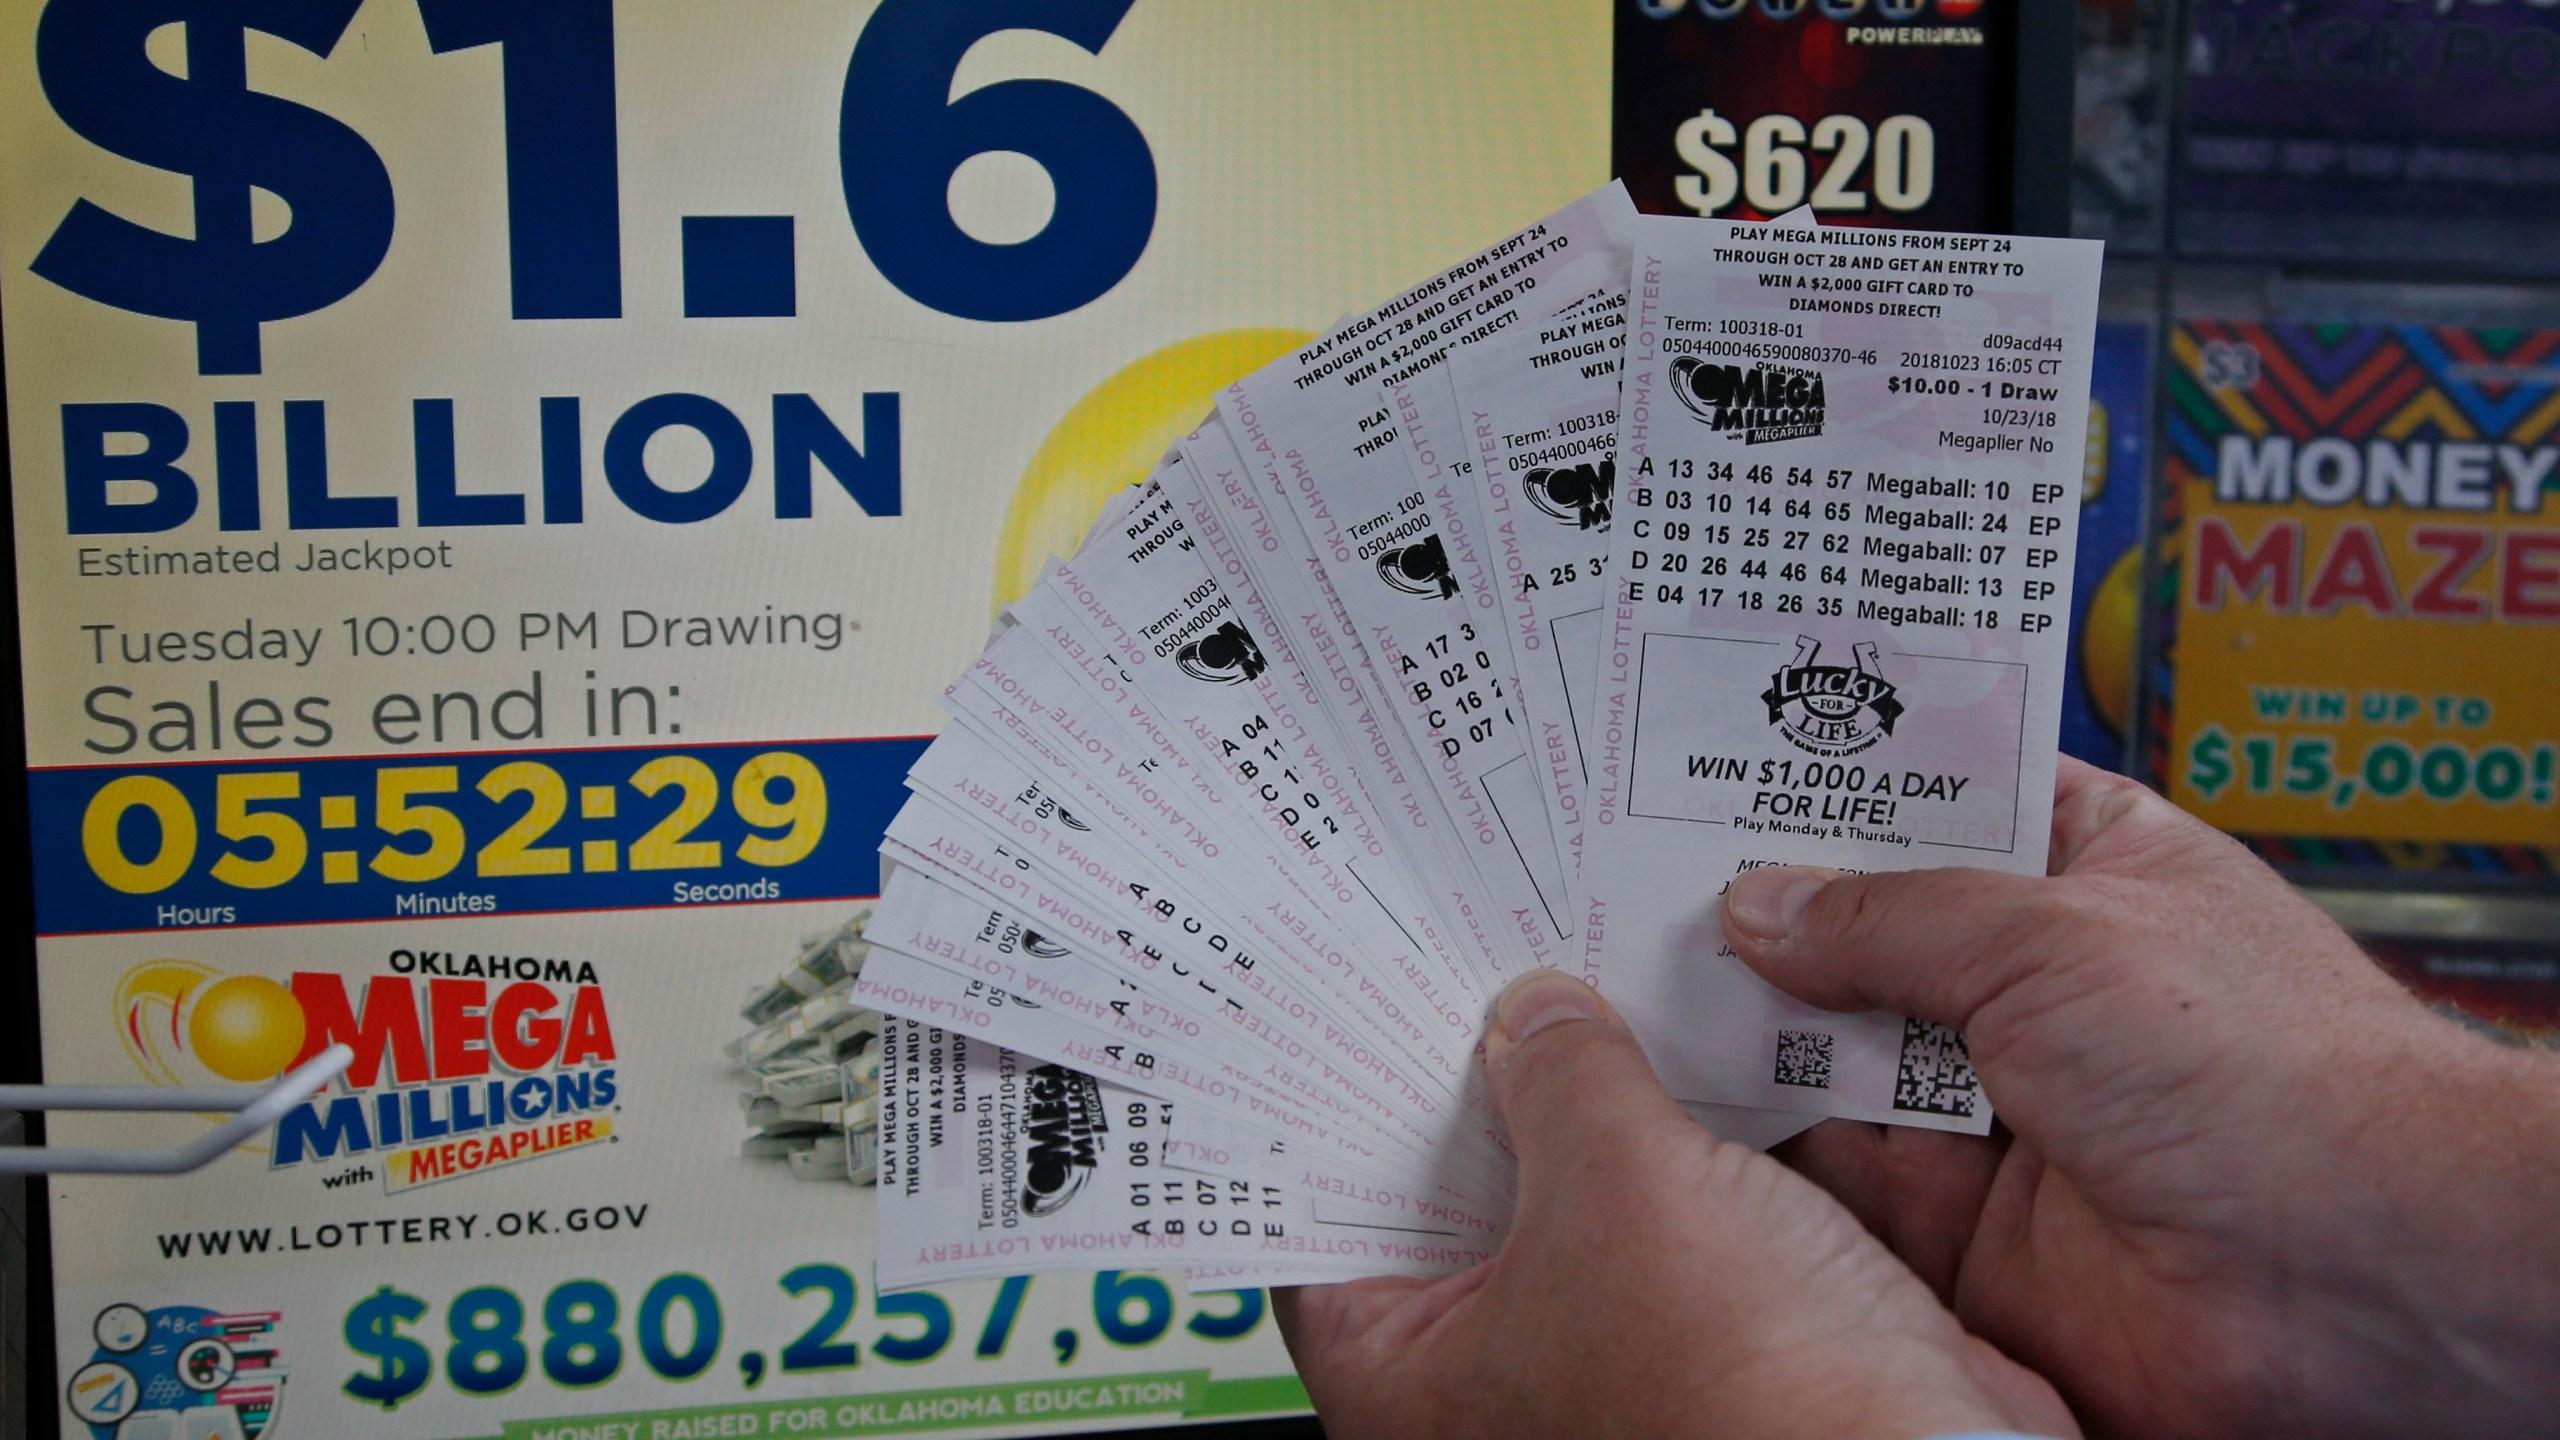 Lottery_Jackpot_82157-159532.jpg47830010